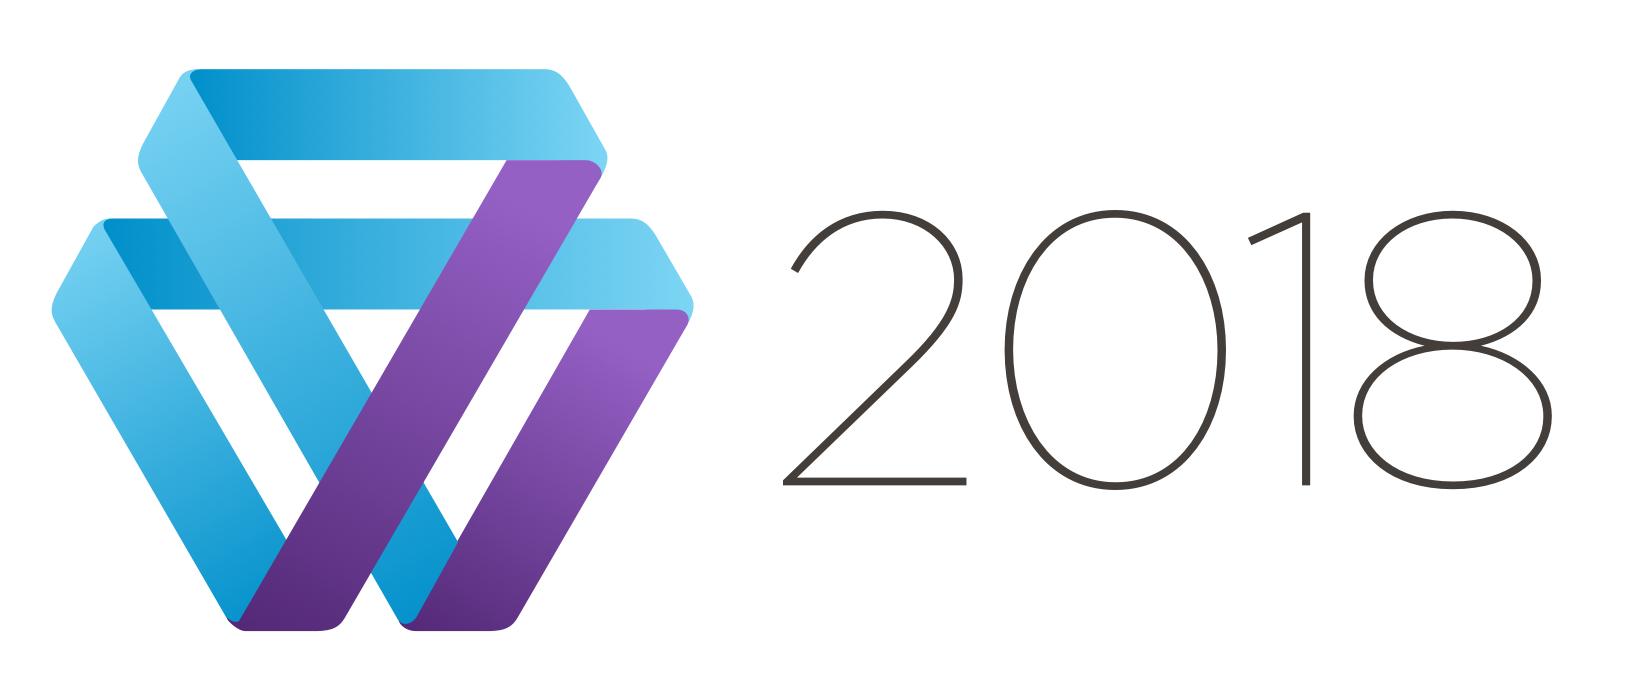 naic_year_blue_purple.jpg